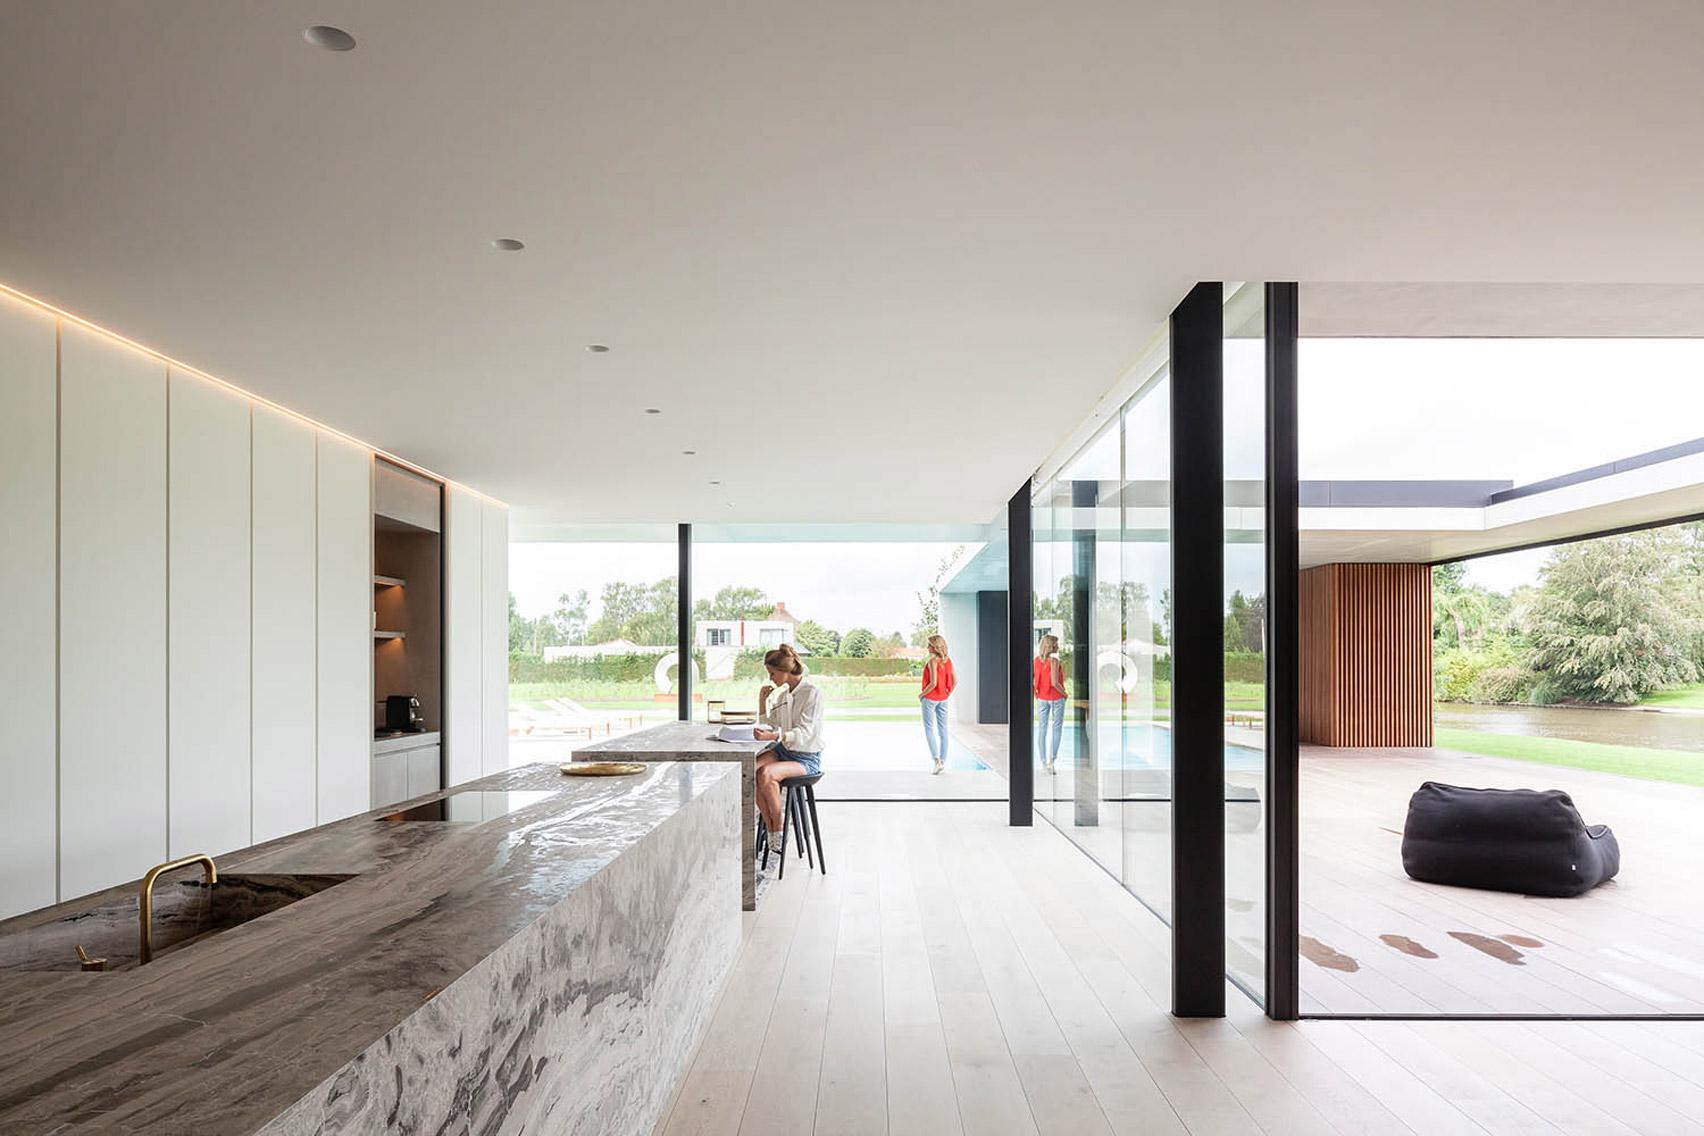 La cucina / Govaert & Vanhoutte Architects